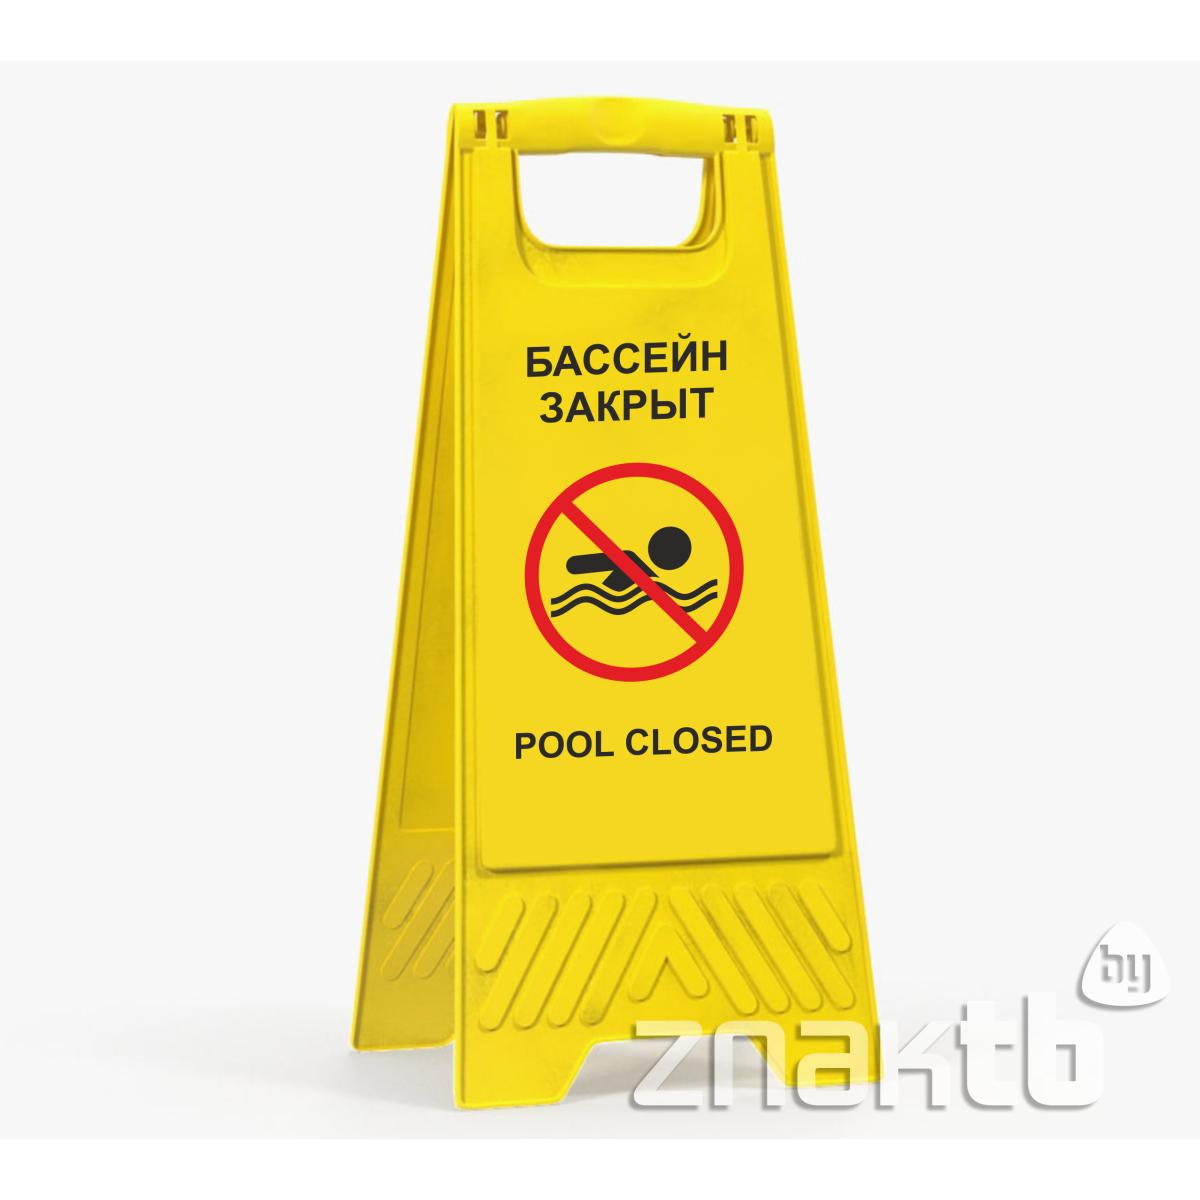 Знак Бассейн закрыт